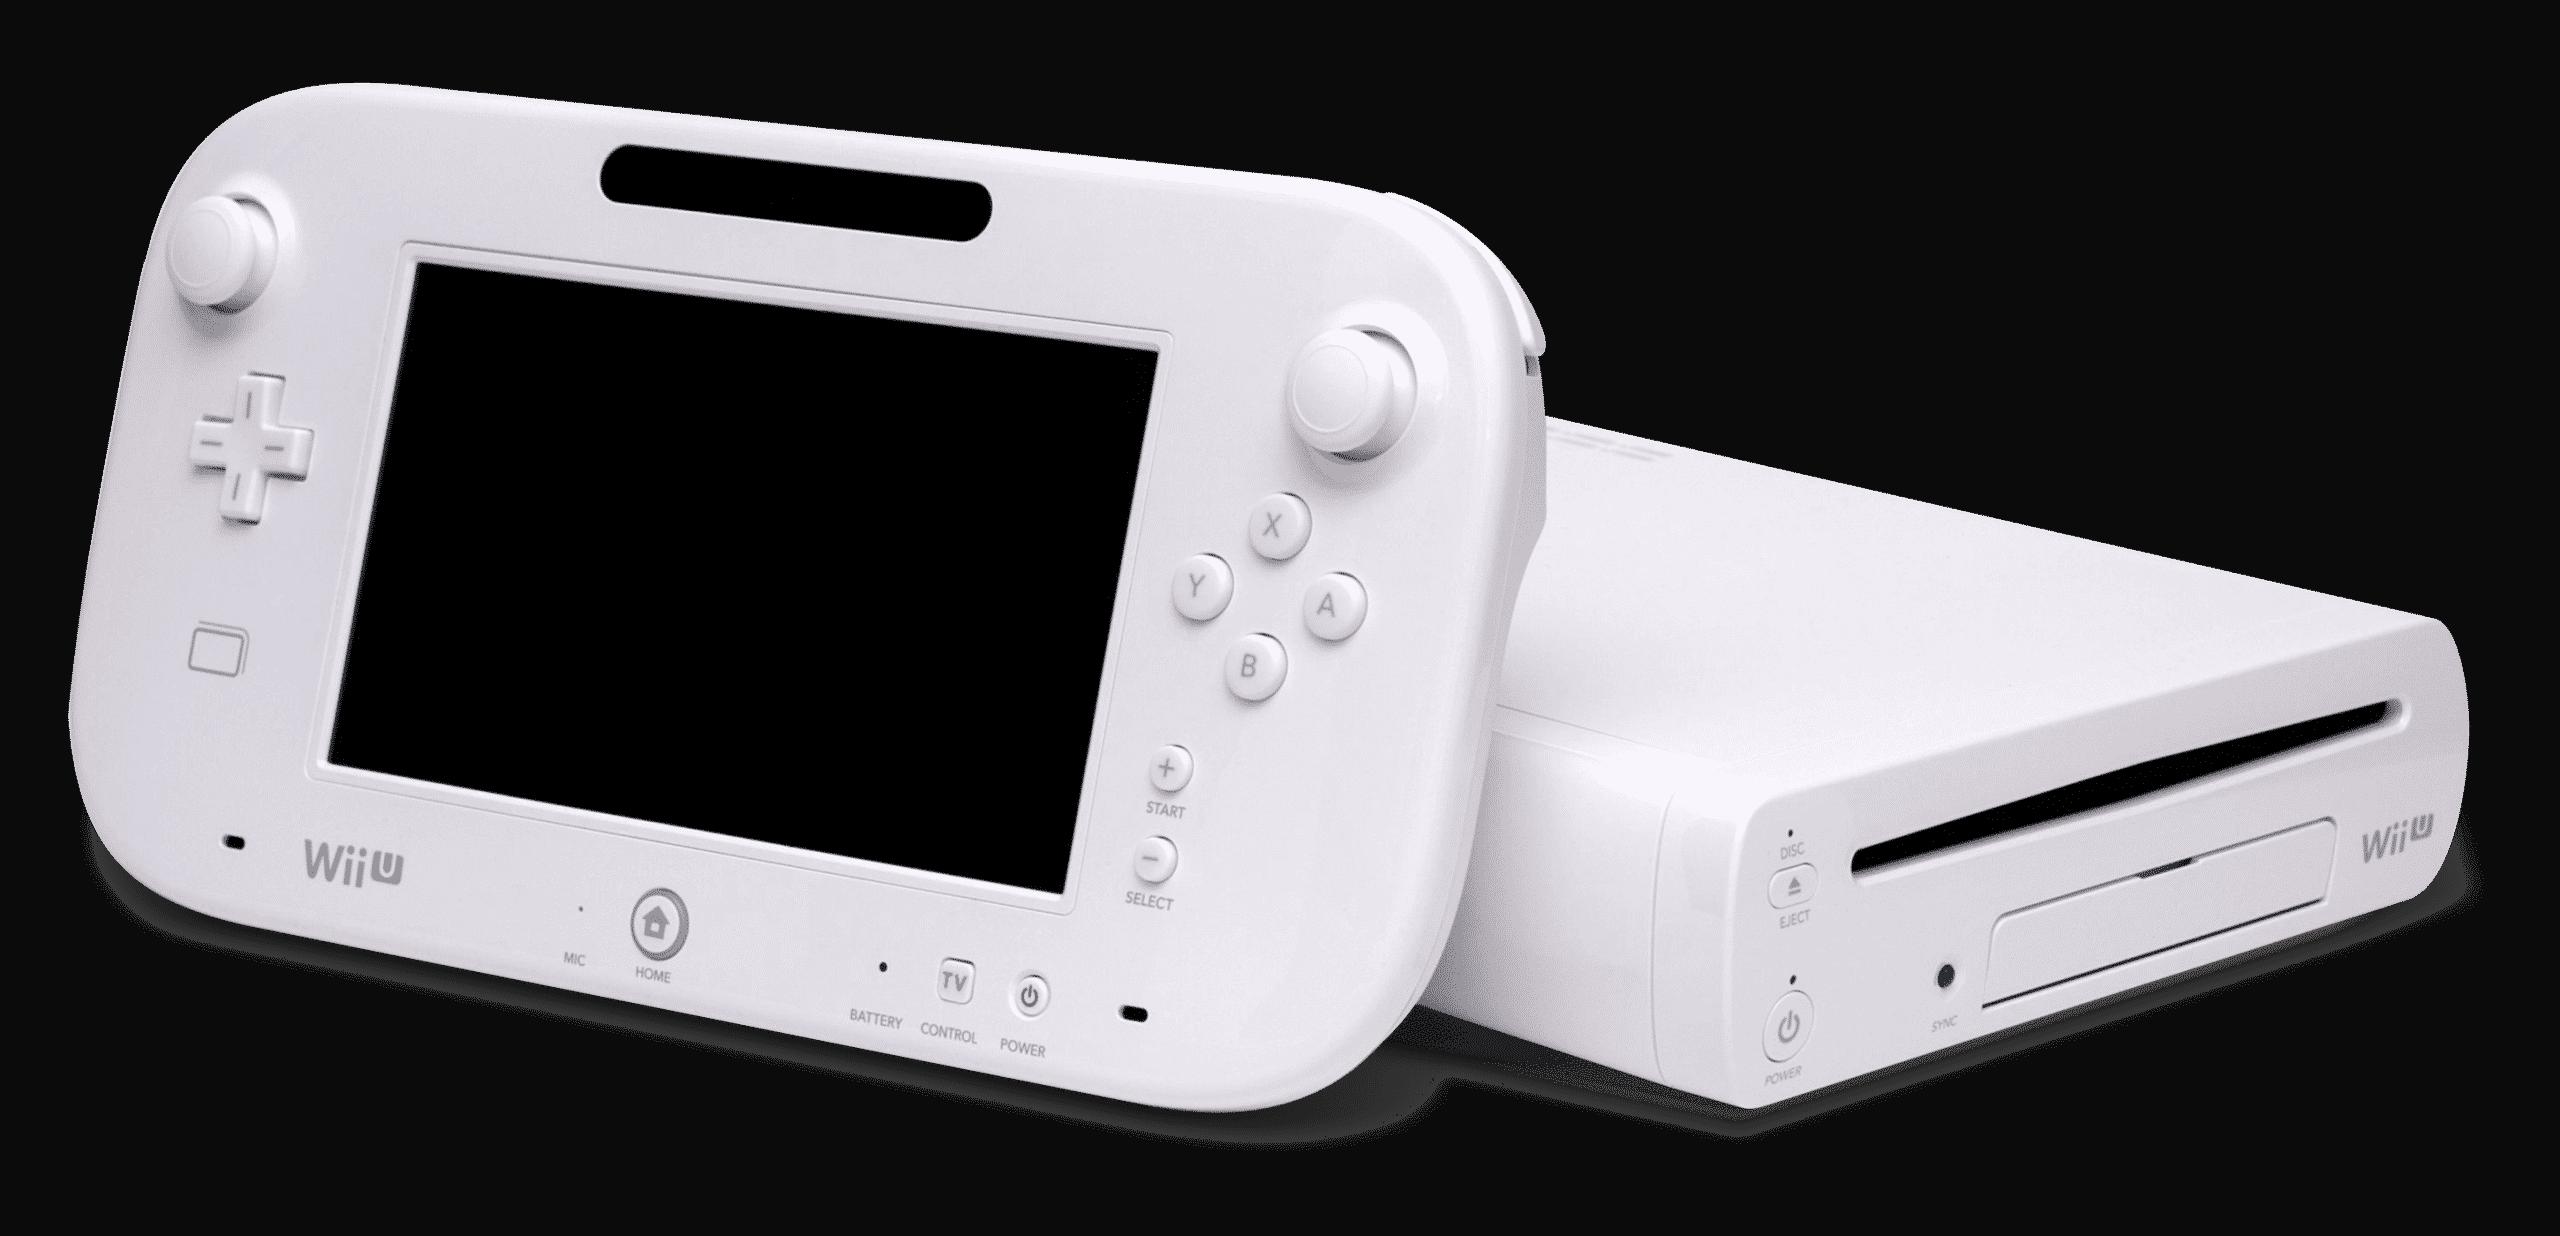 Réparation Wii U